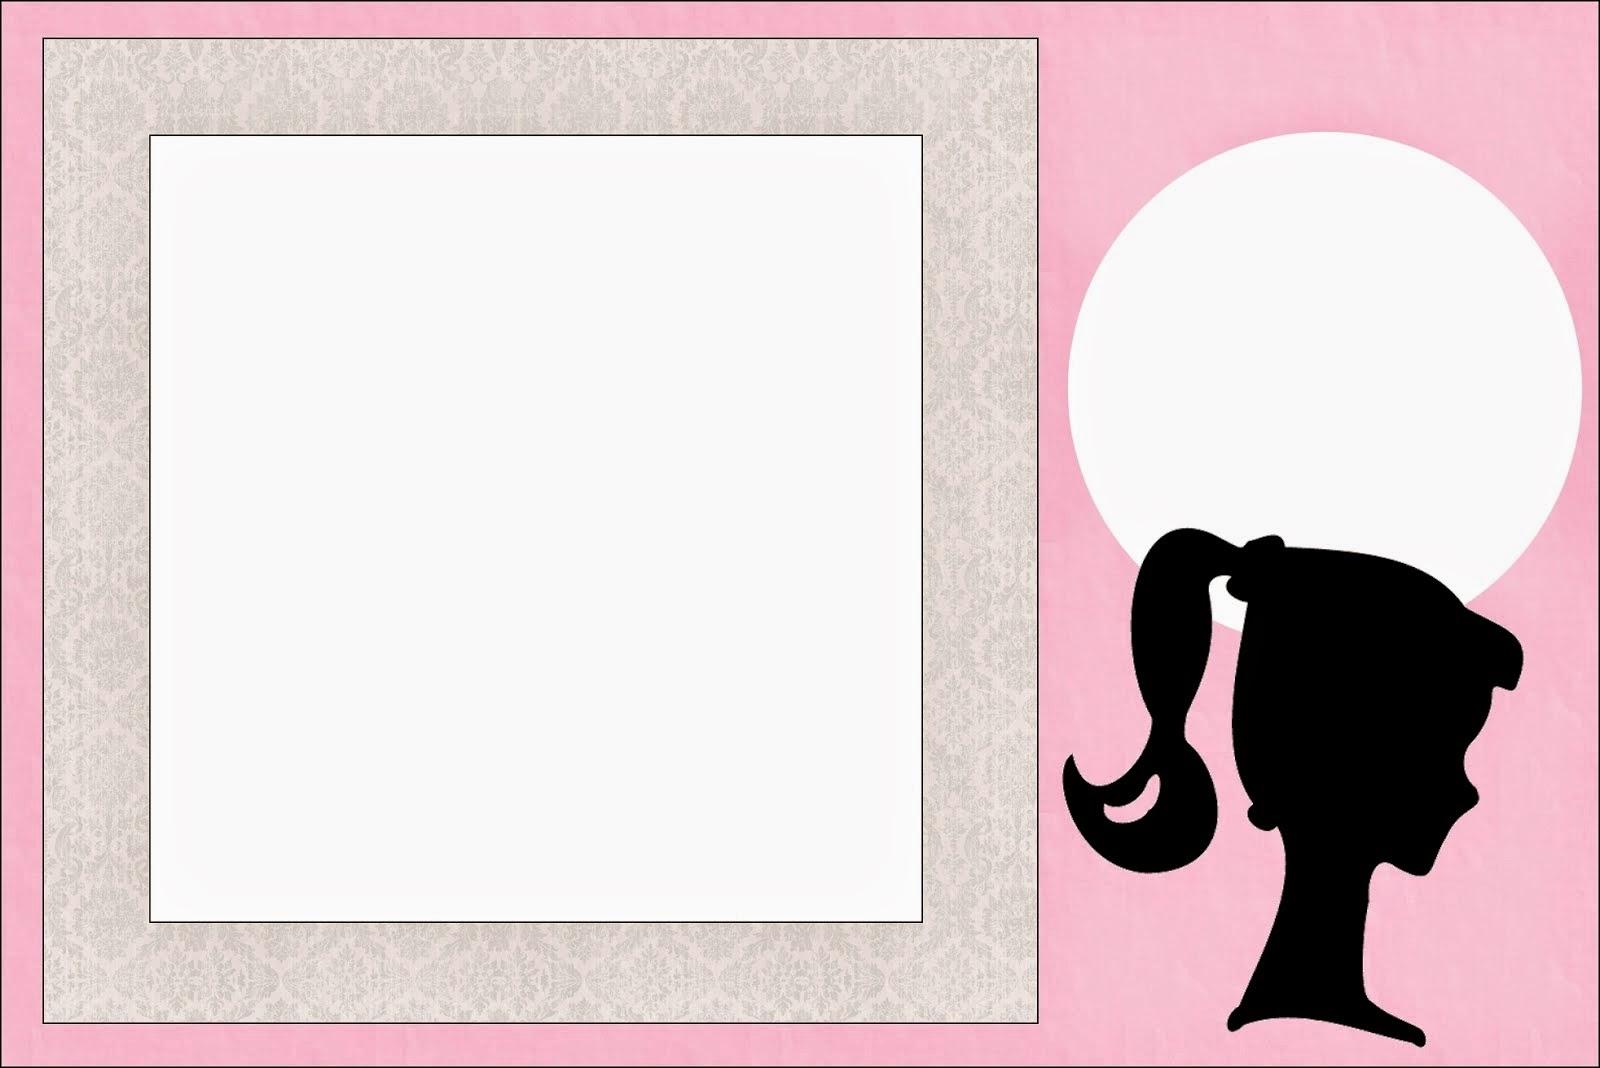 Barbie Silhouette Free Printable Invitations Oh My Fiesta in